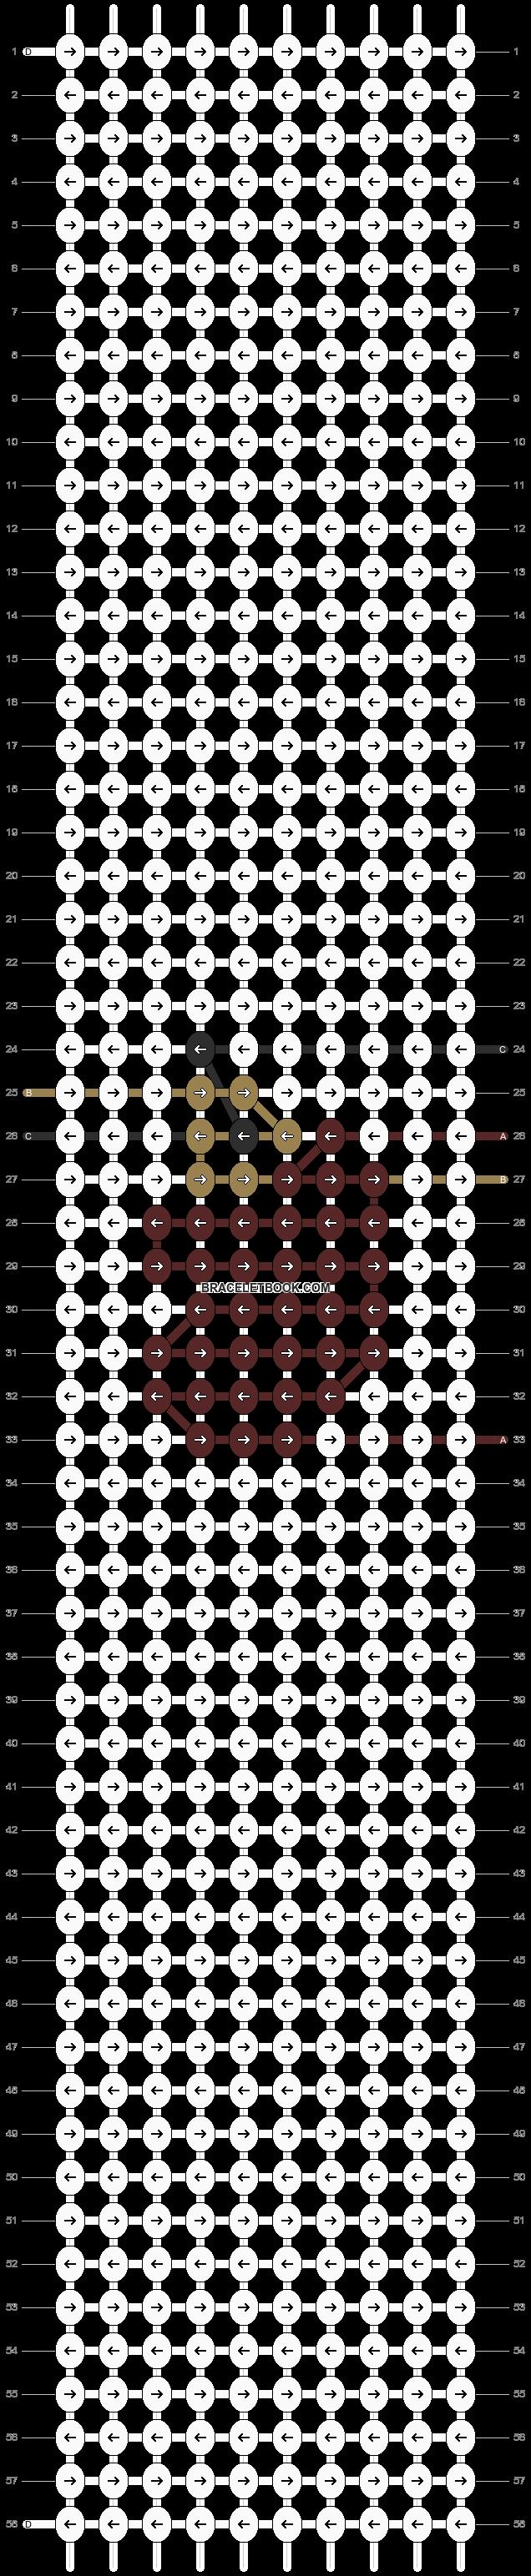 Alpha pattern #23680 pattern